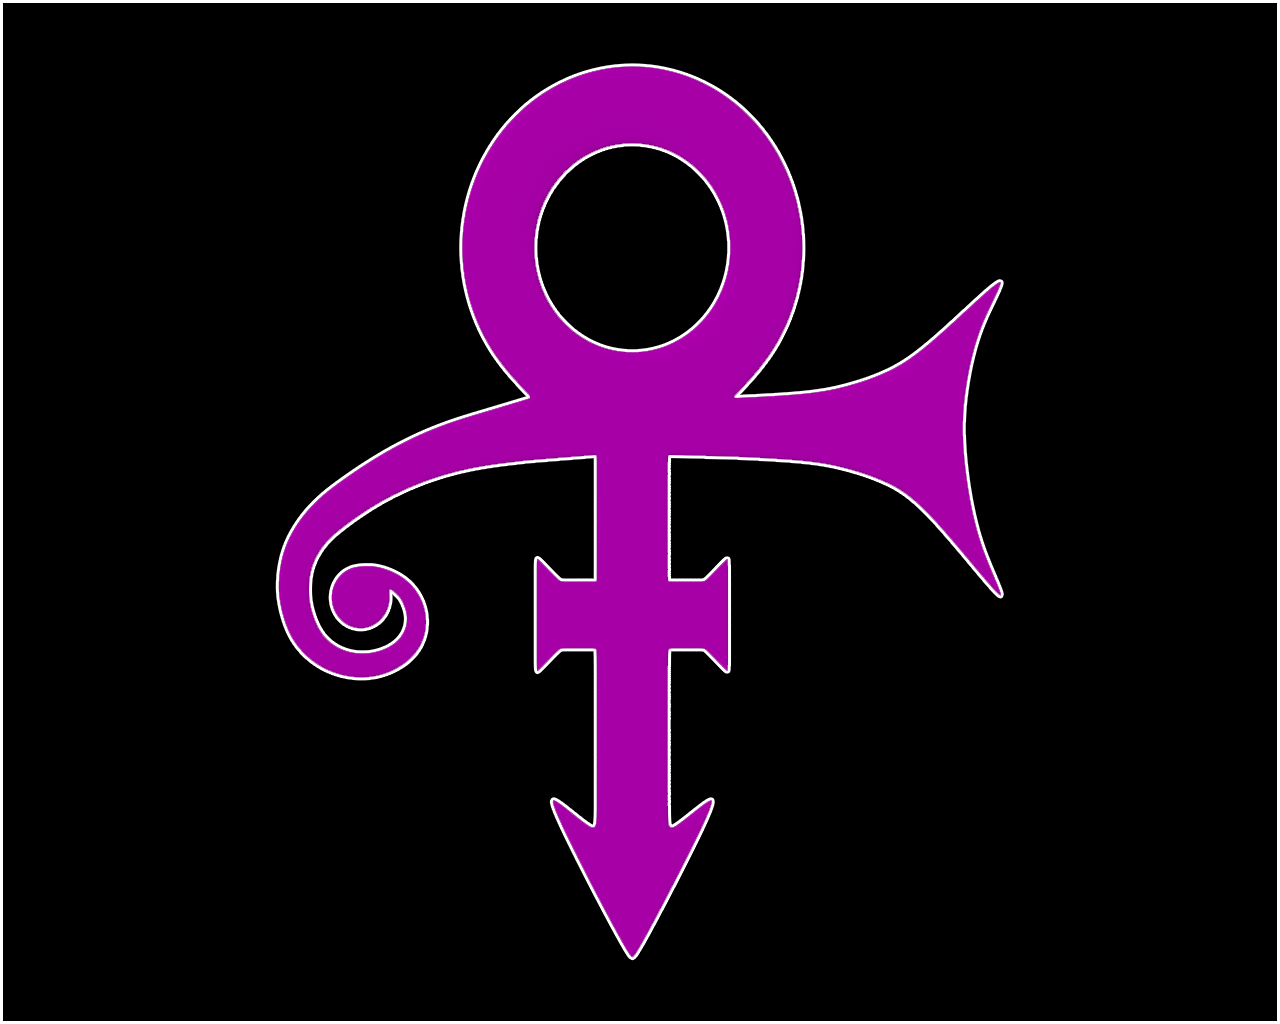 The Prince Symbol